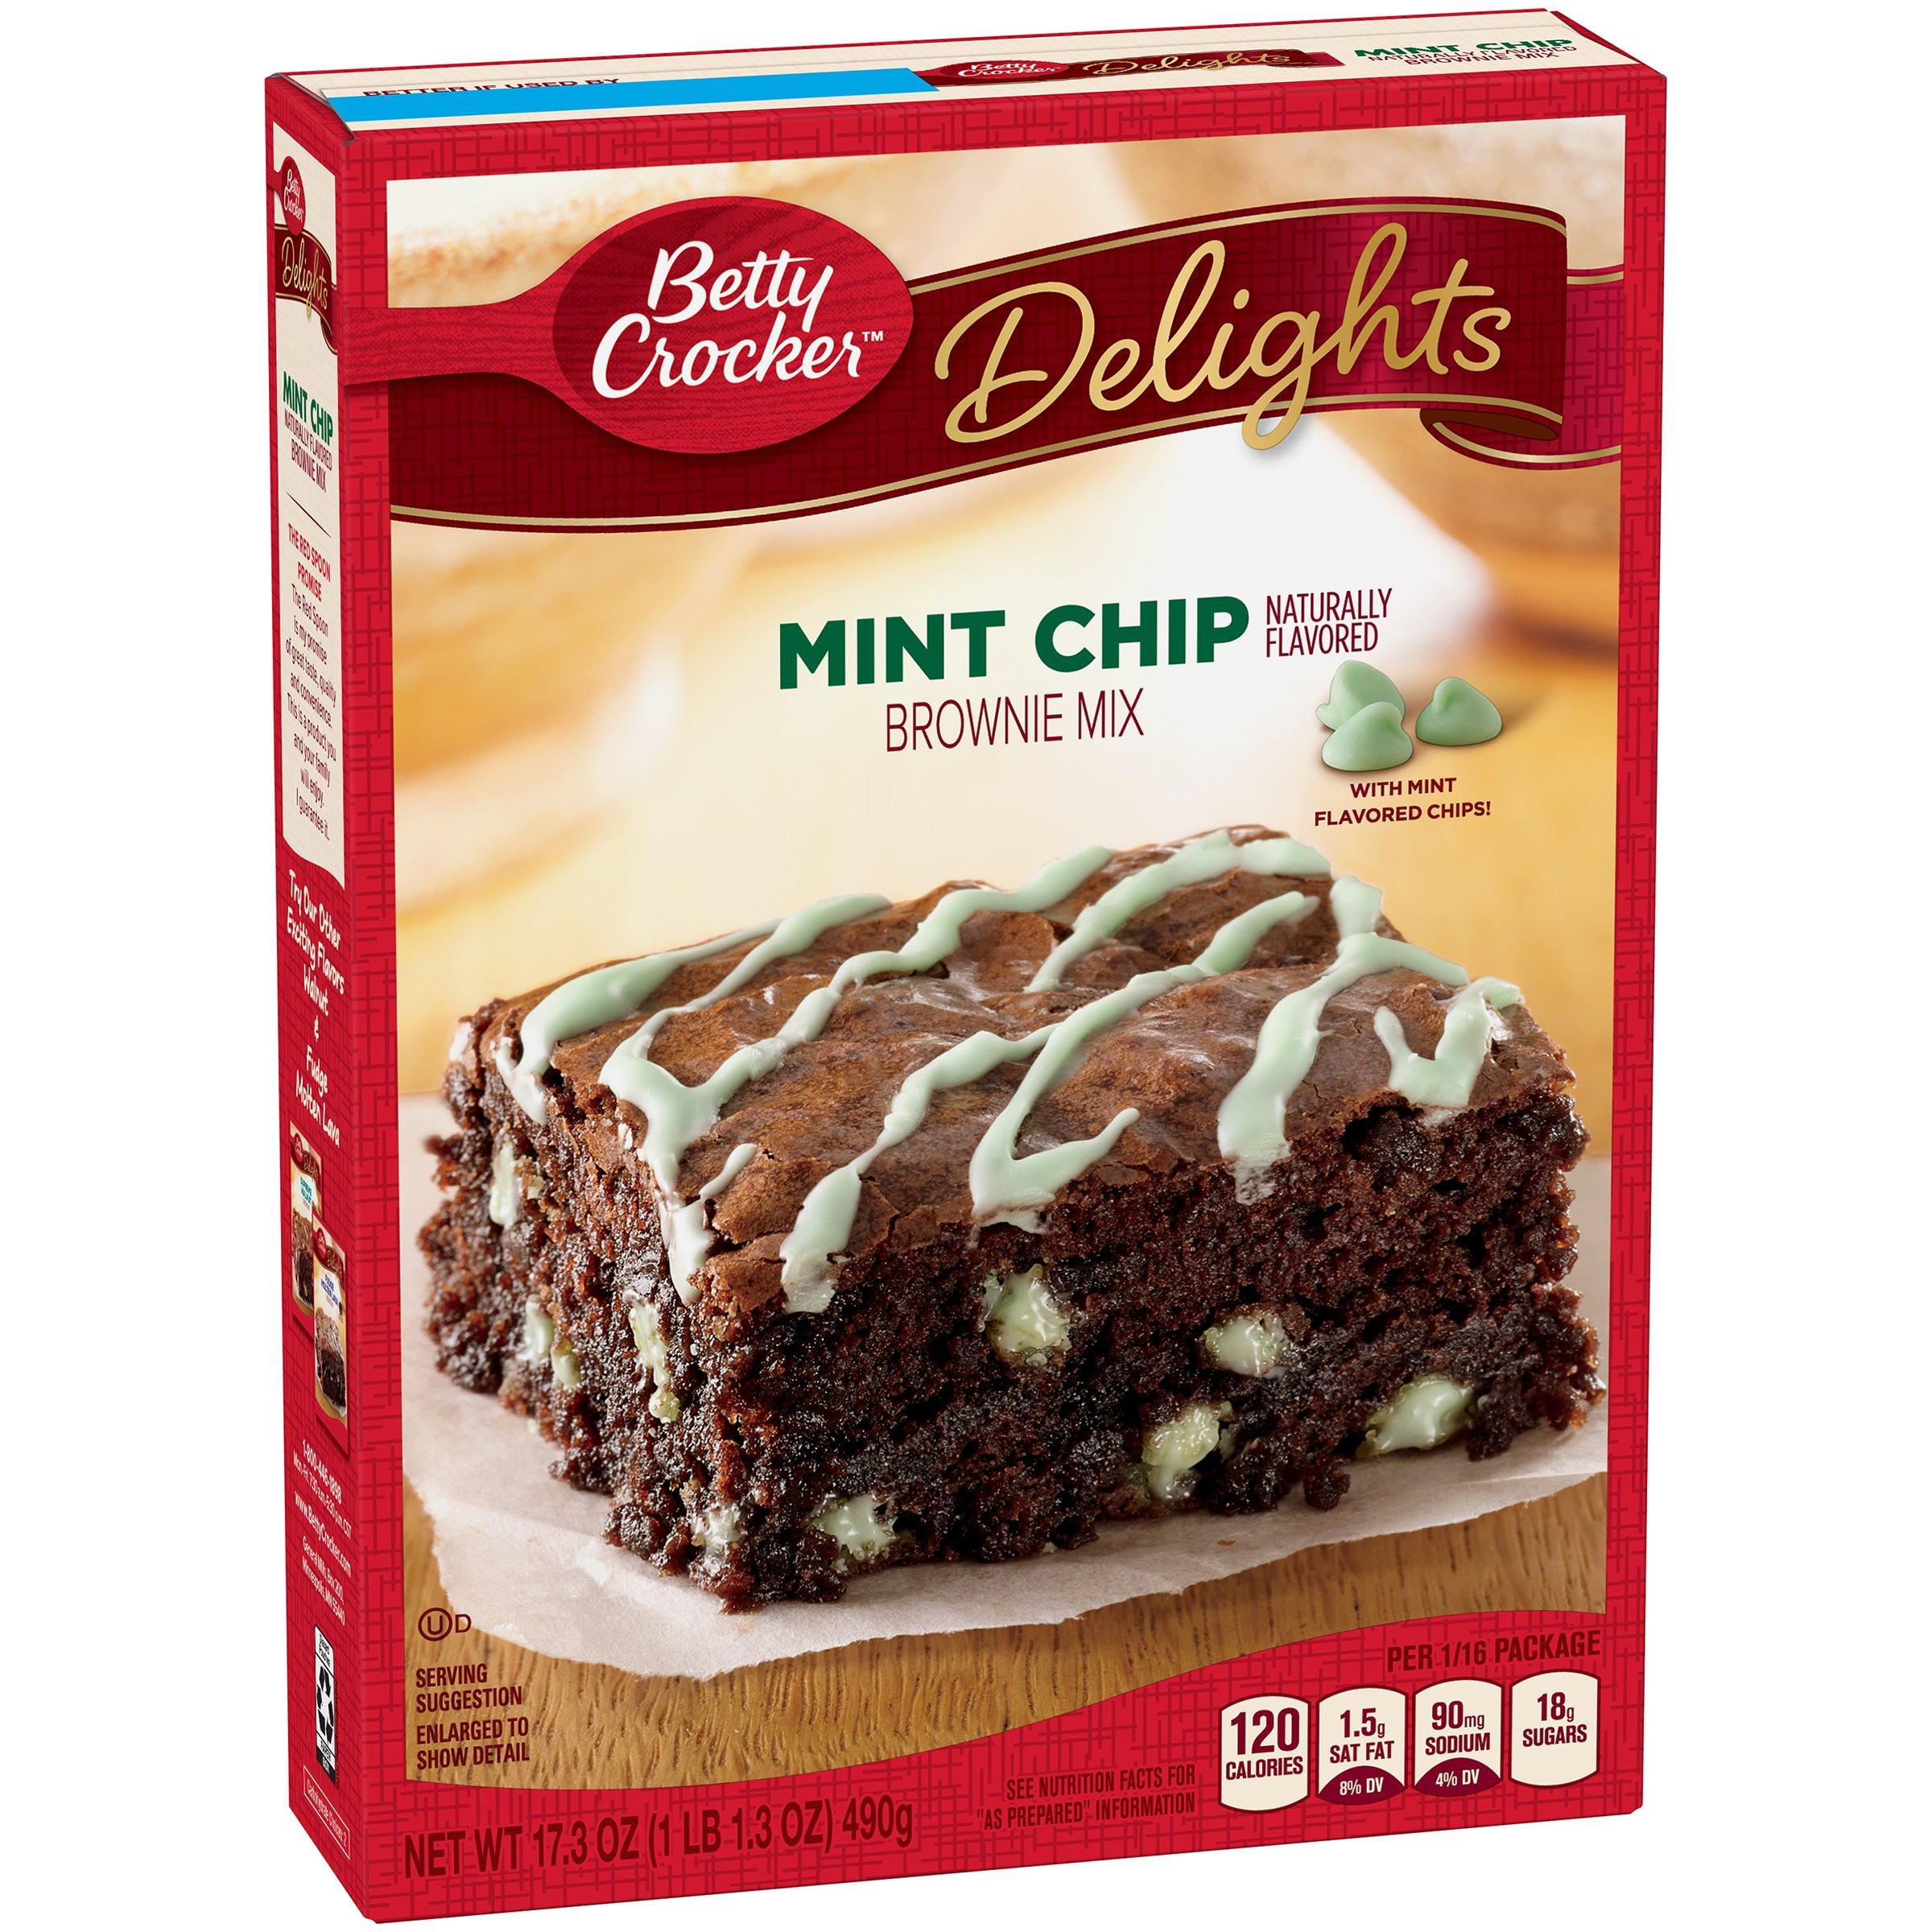 Betty Crocker Delights Mint Chip Brownie Mix 17.3 oz. Box